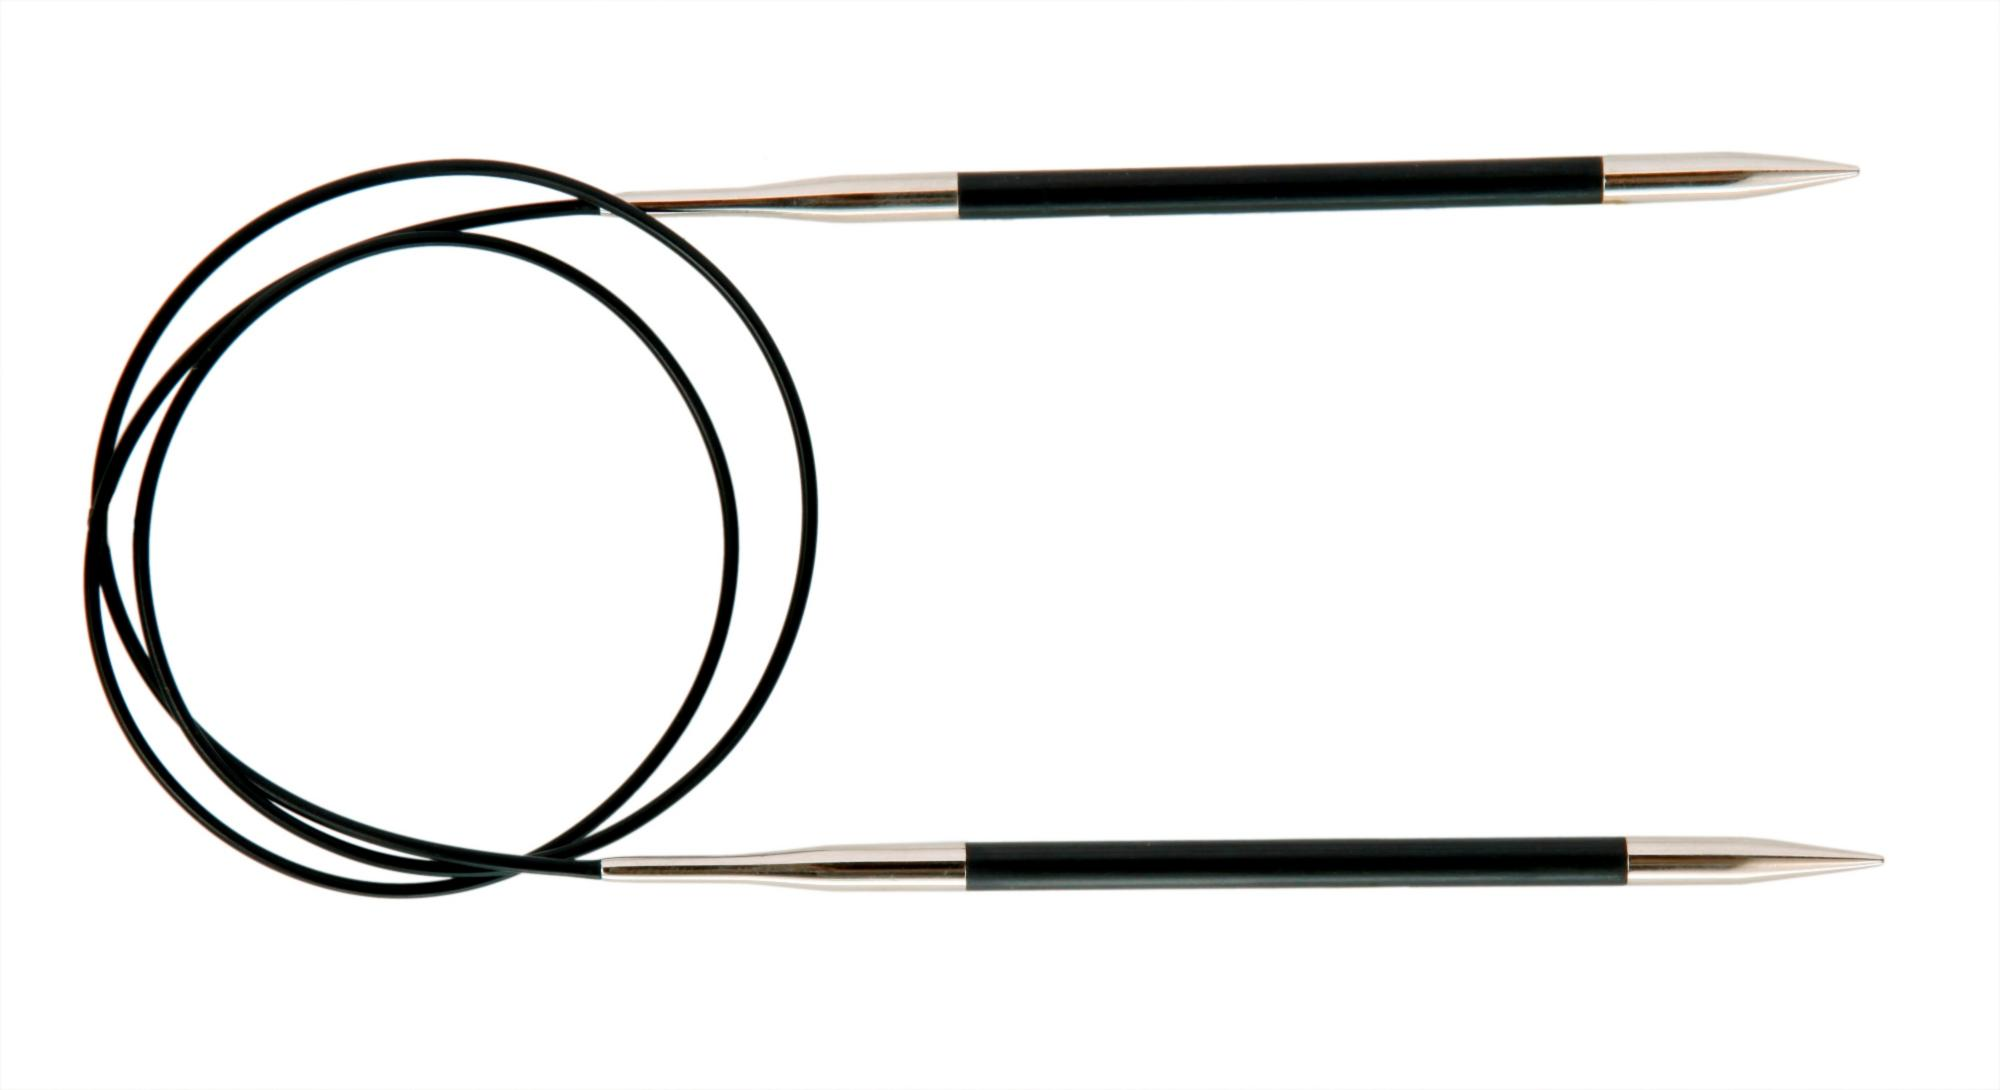 Спицы круговые 100 см Karbonz KnitPro, 41201, 2.00 мм